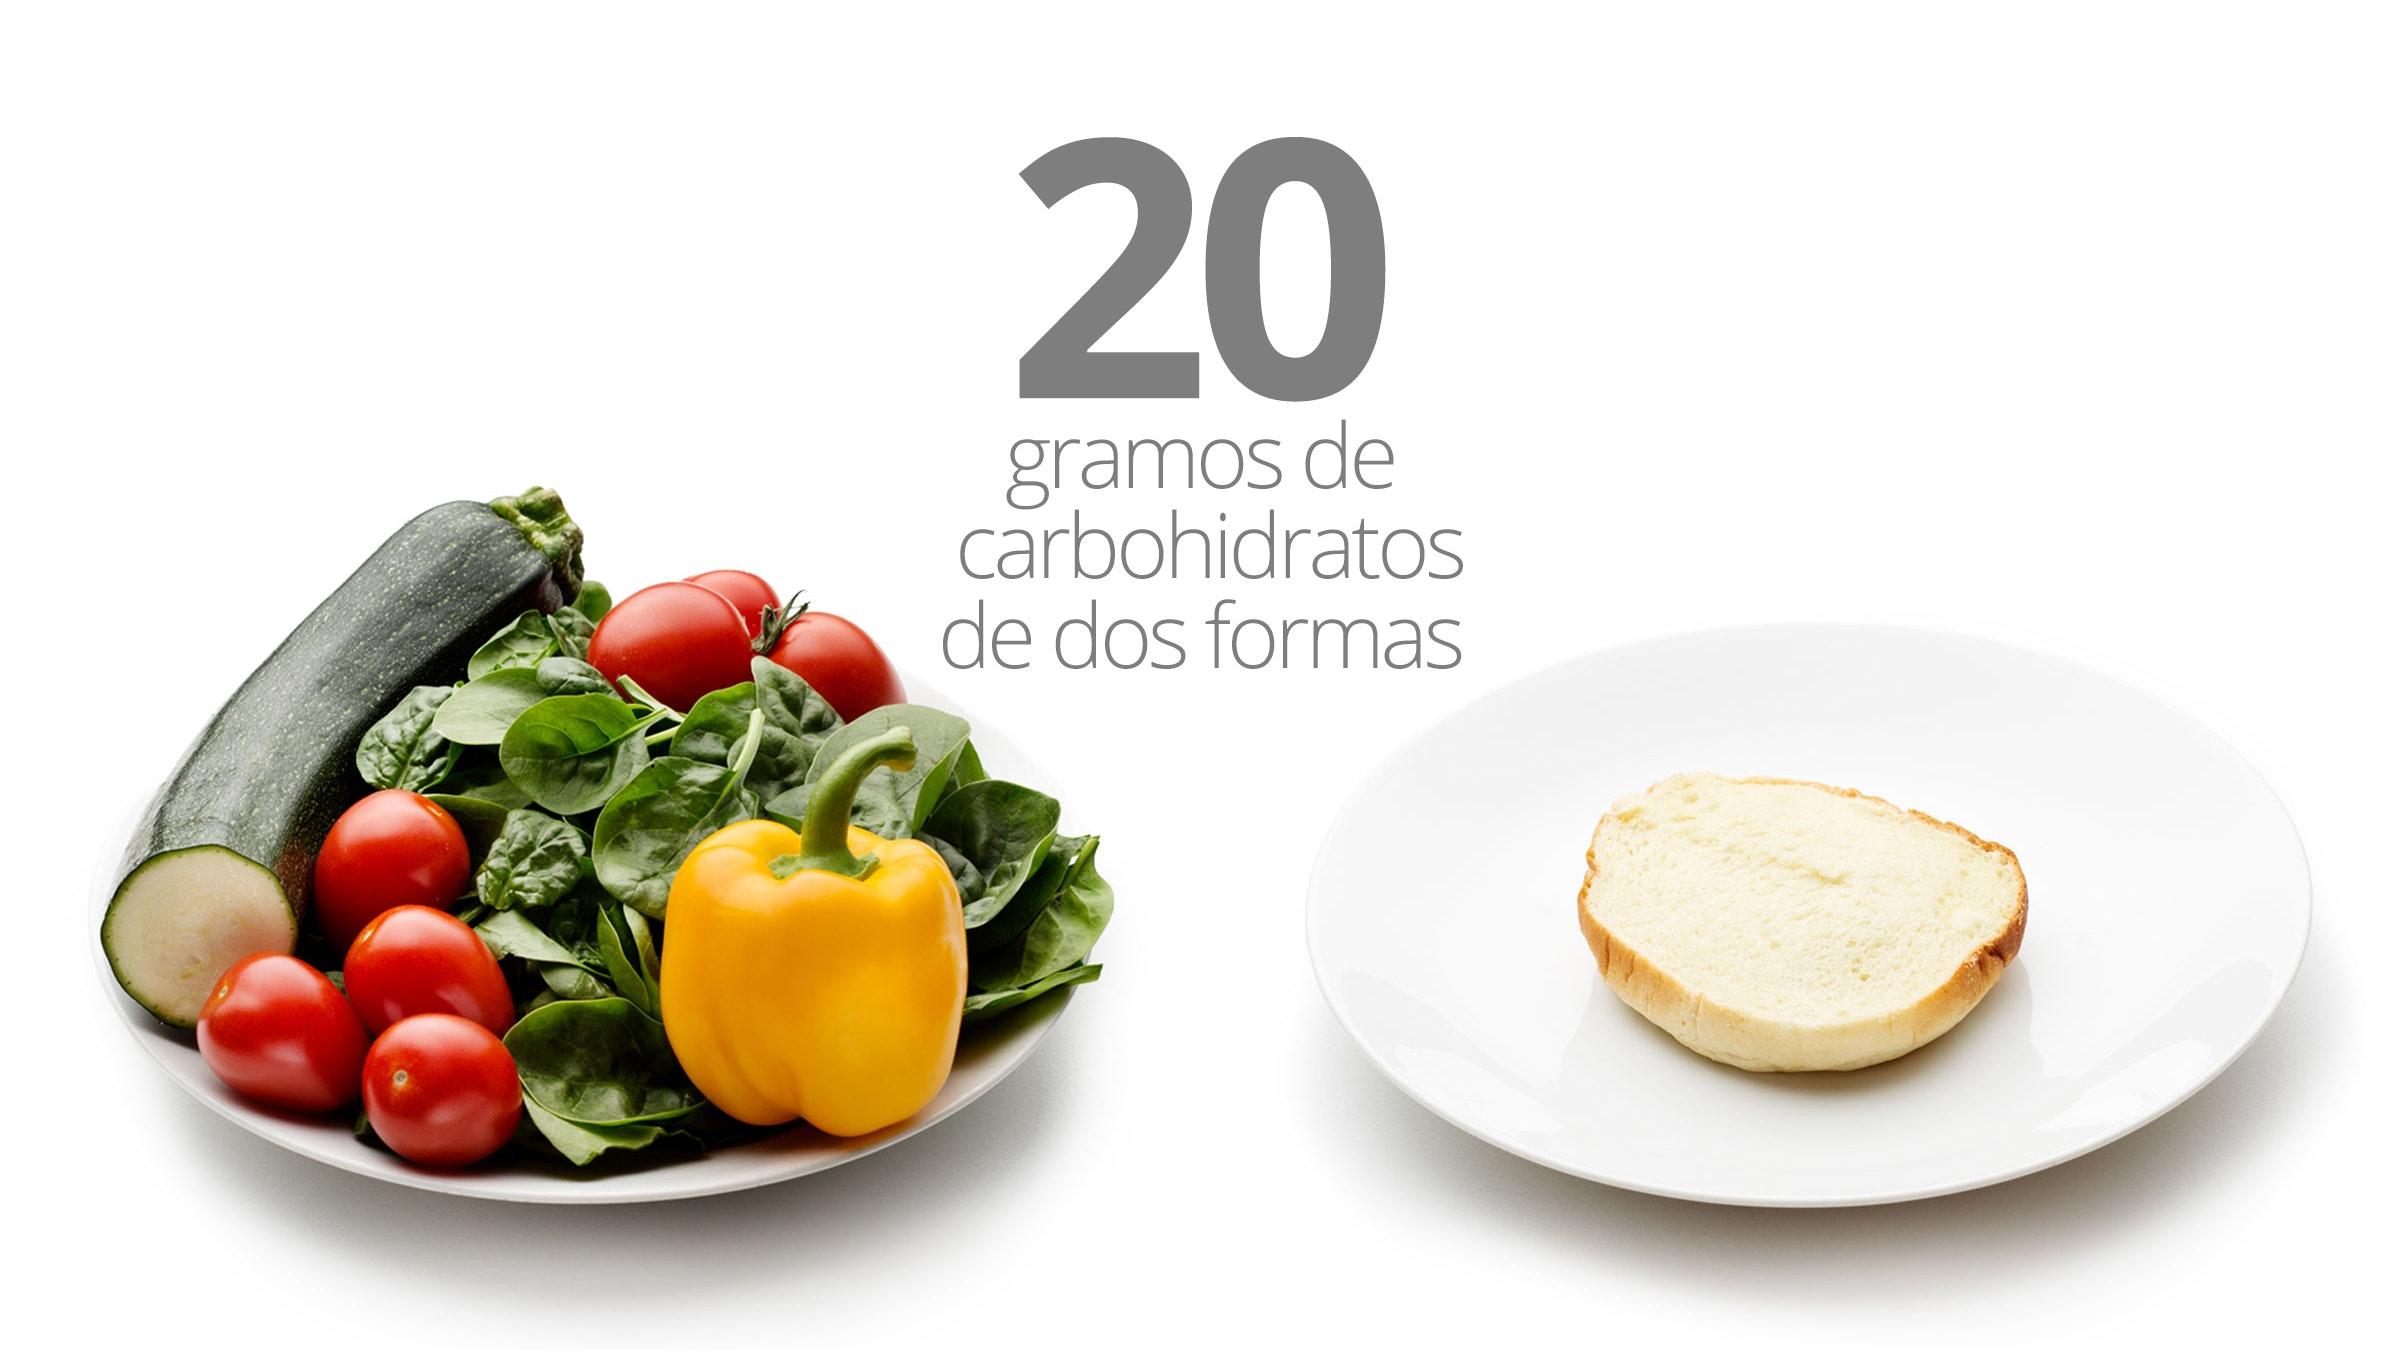 Dieta cetogenica gramos de carbohidratos